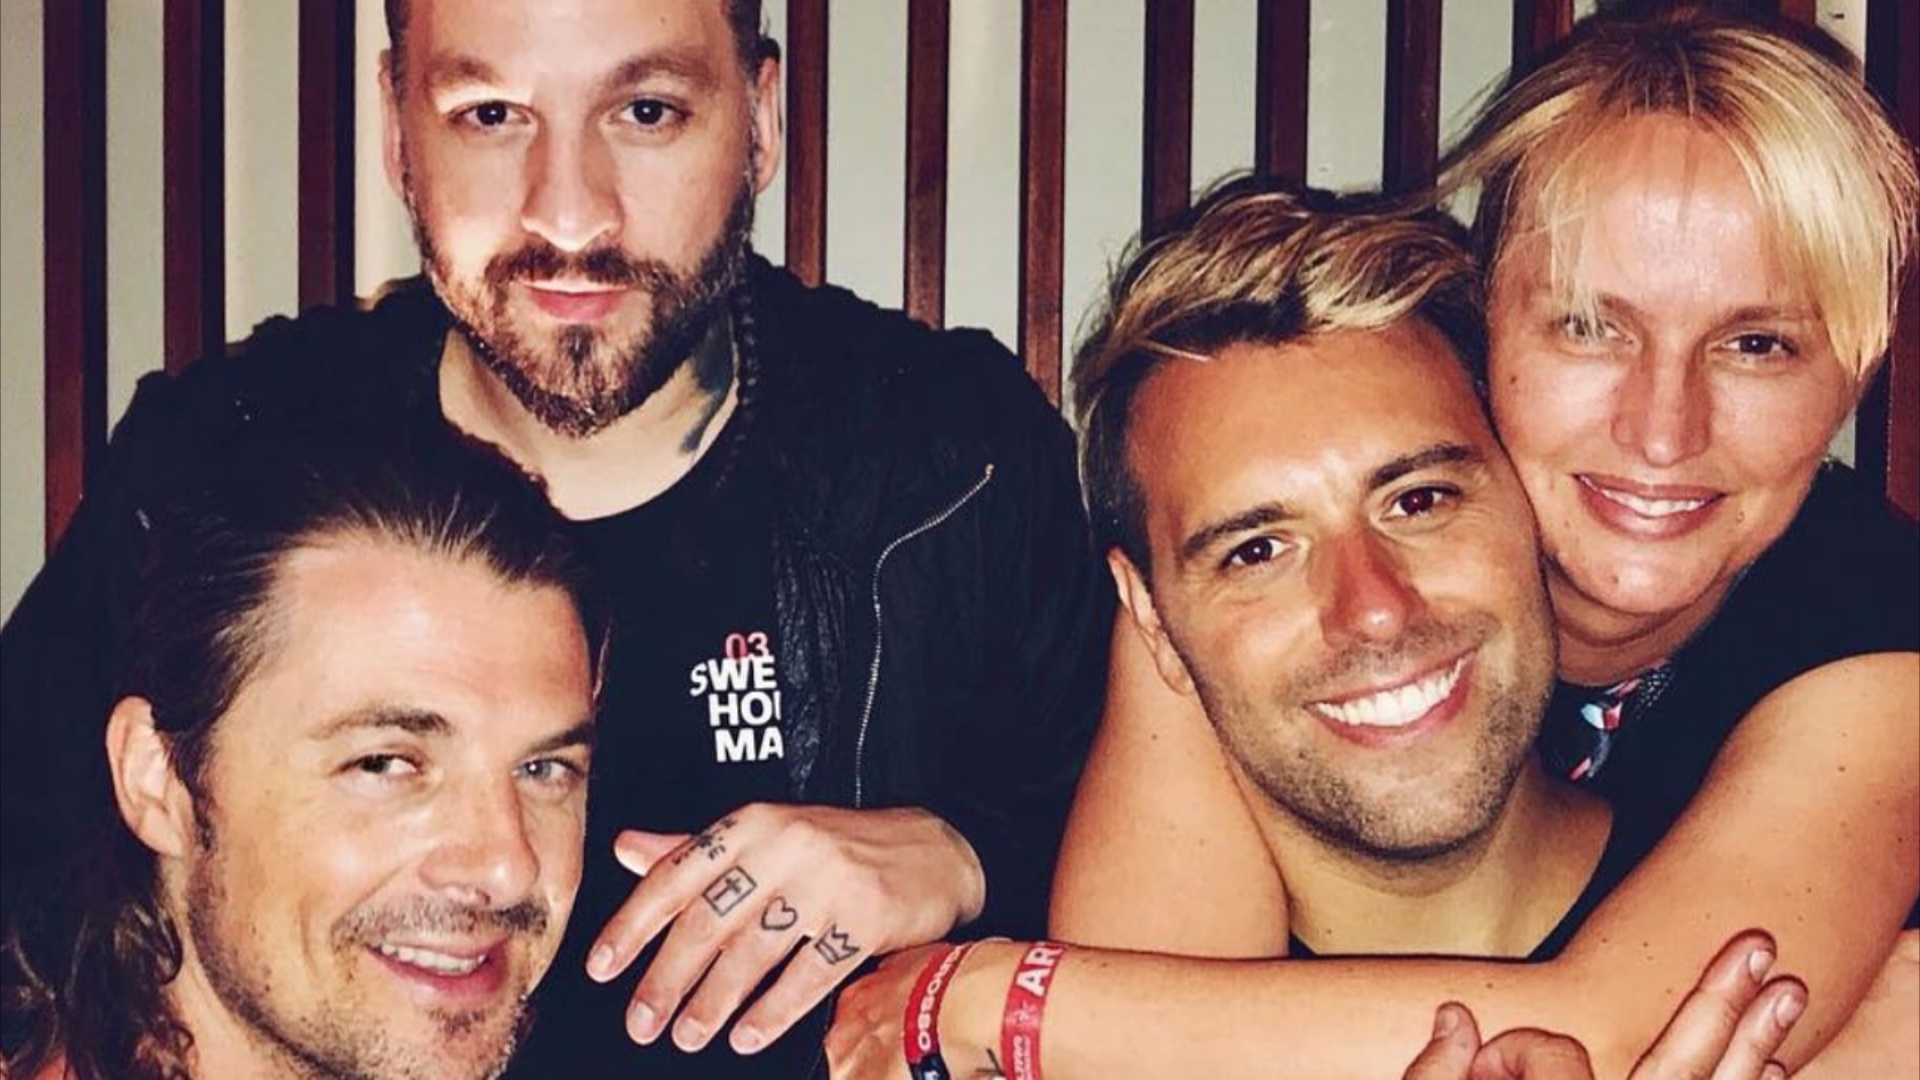 Swedish House Mafia mollati dalla manager Amy Thomson